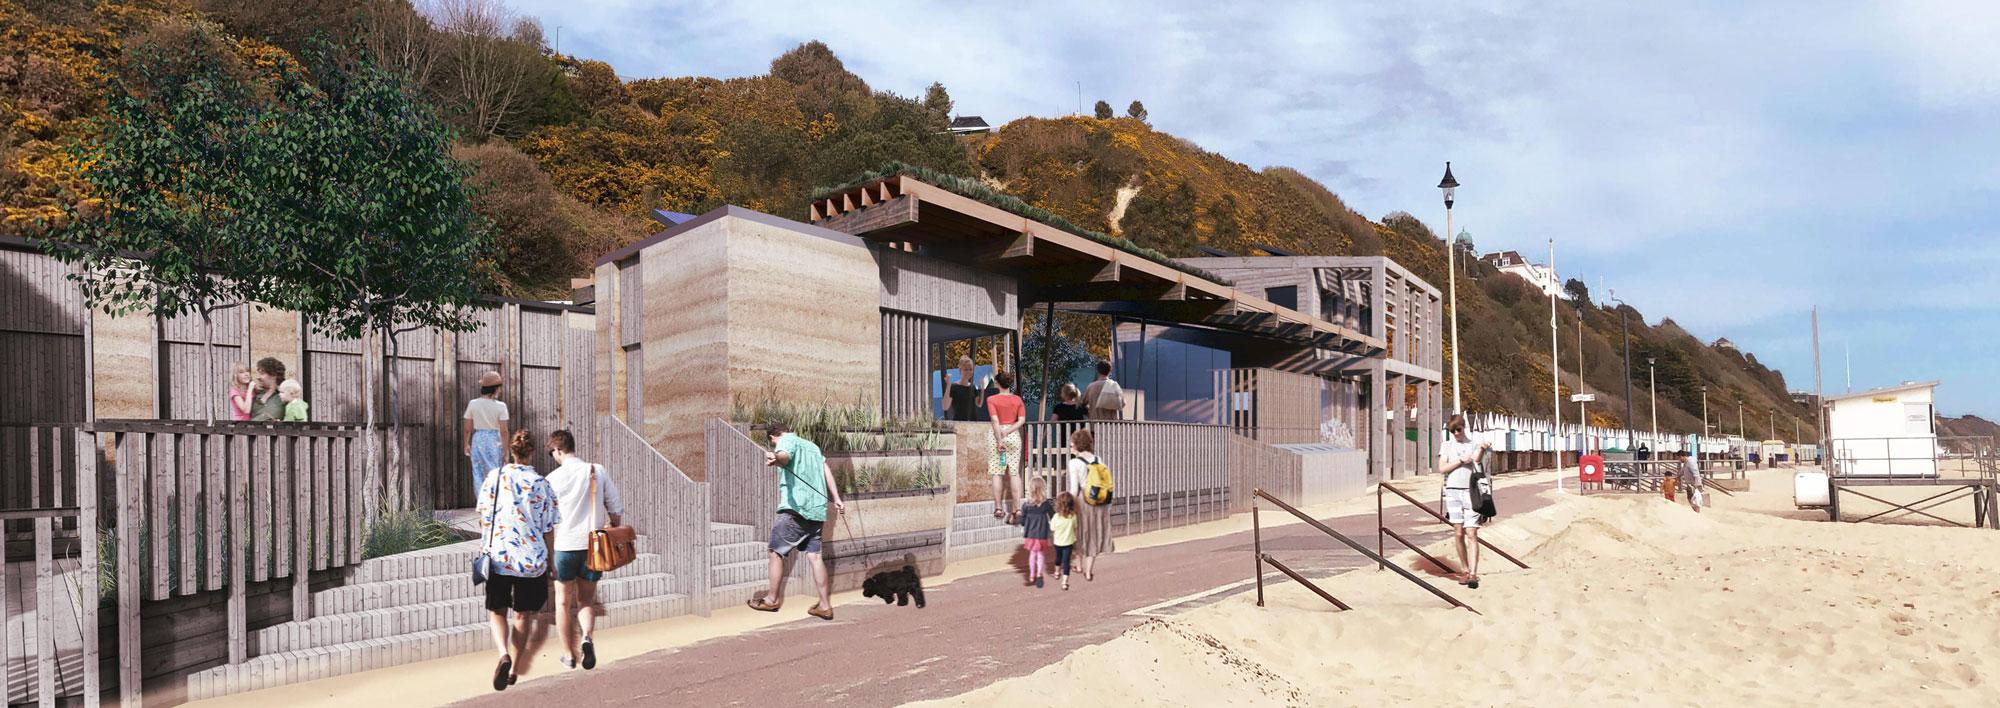 Durley Environmental Innovation Hub